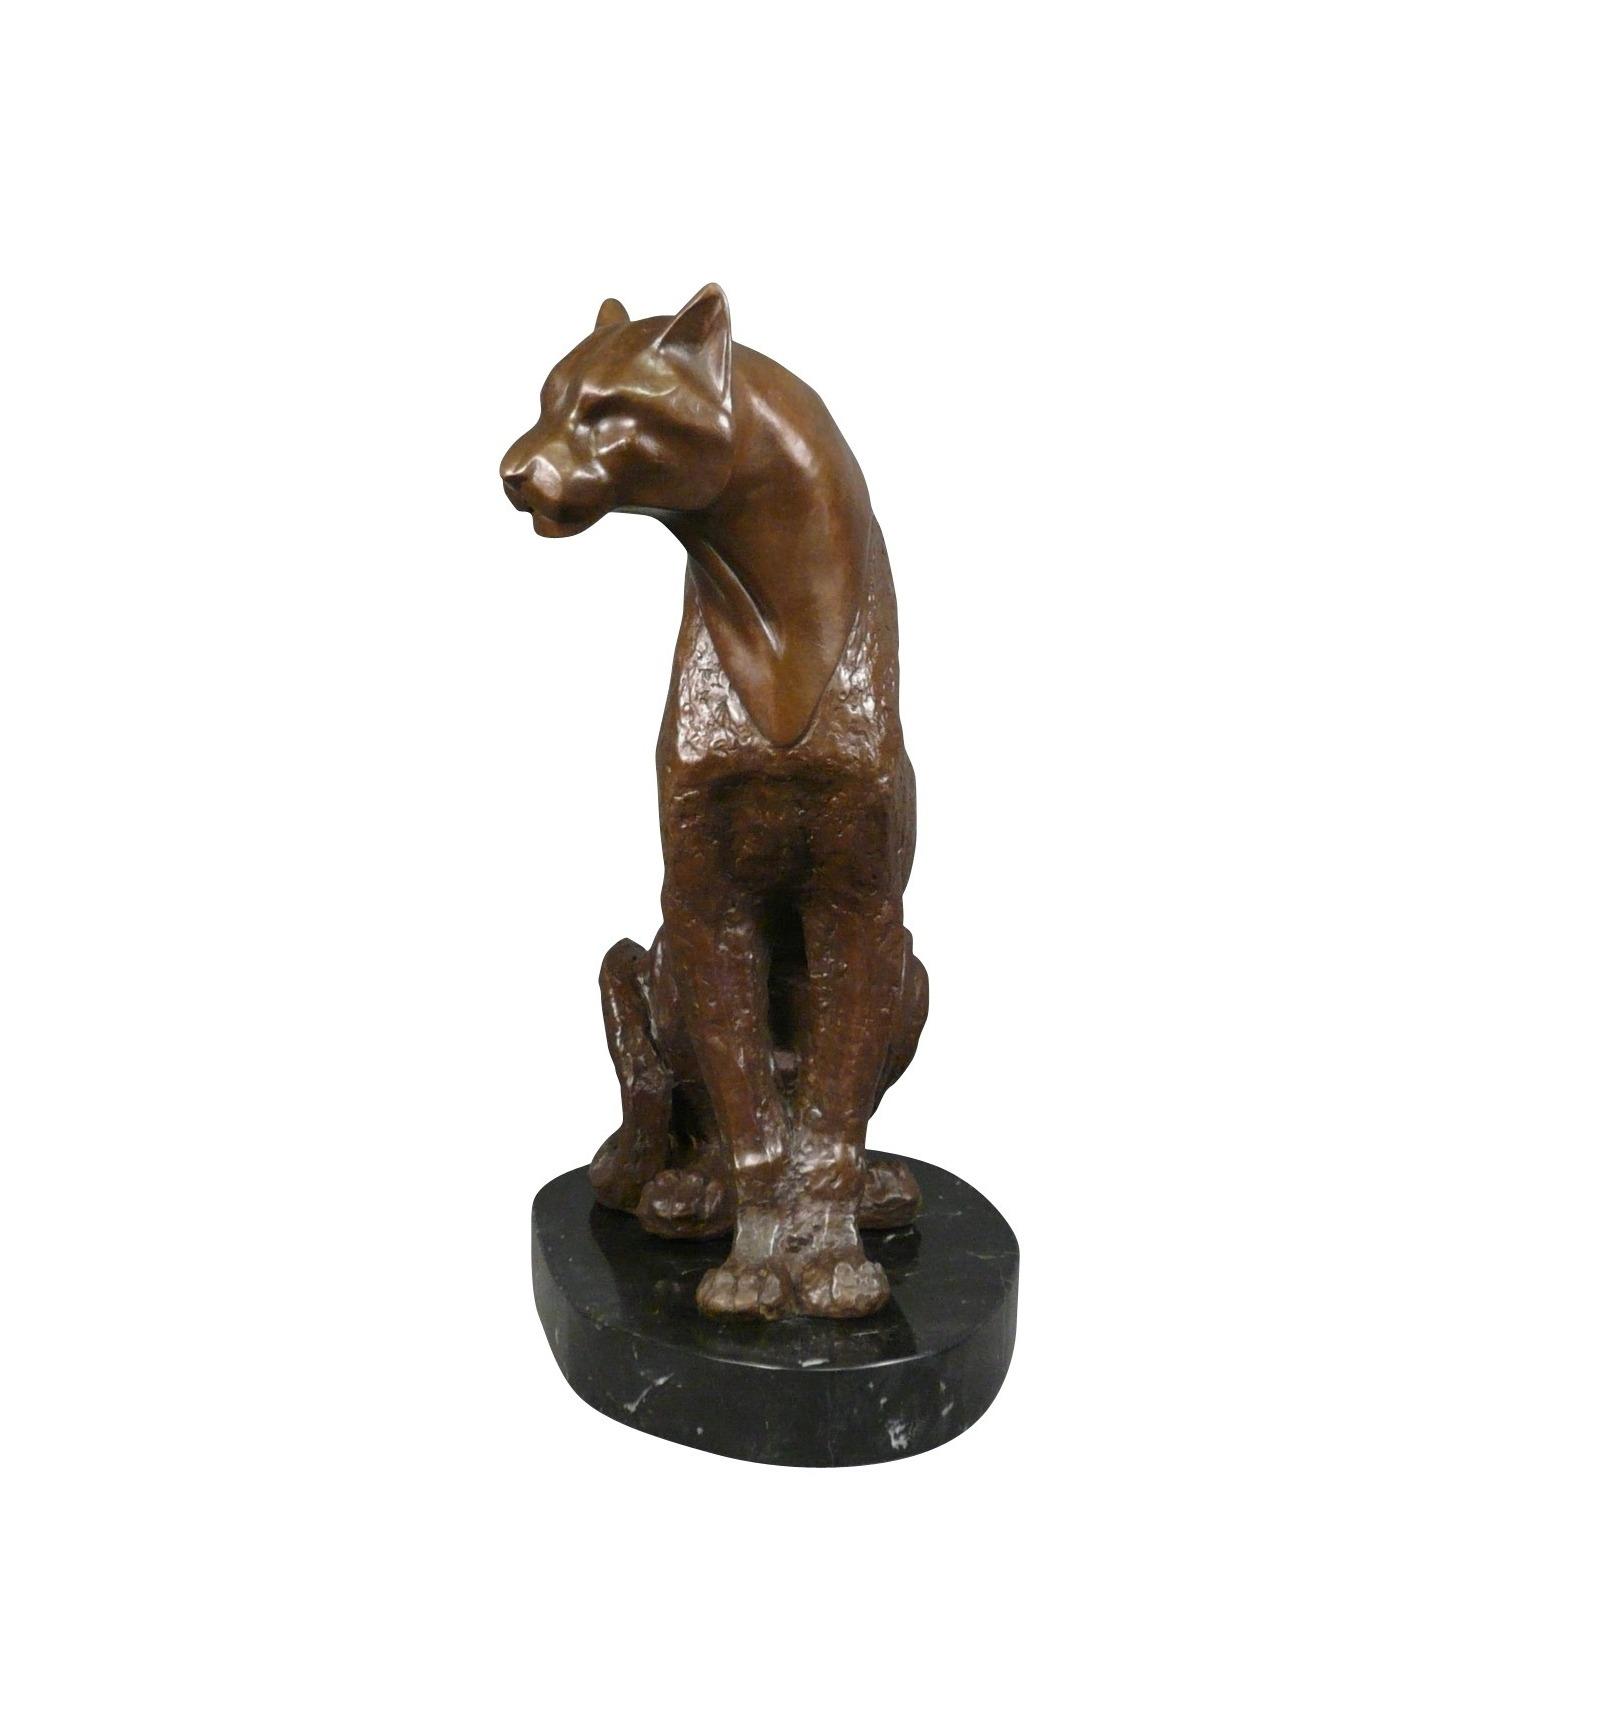 statue en bronze la panth re assise sculpture d 39 art. Black Bedroom Furniture Sets. Home Design Ideas